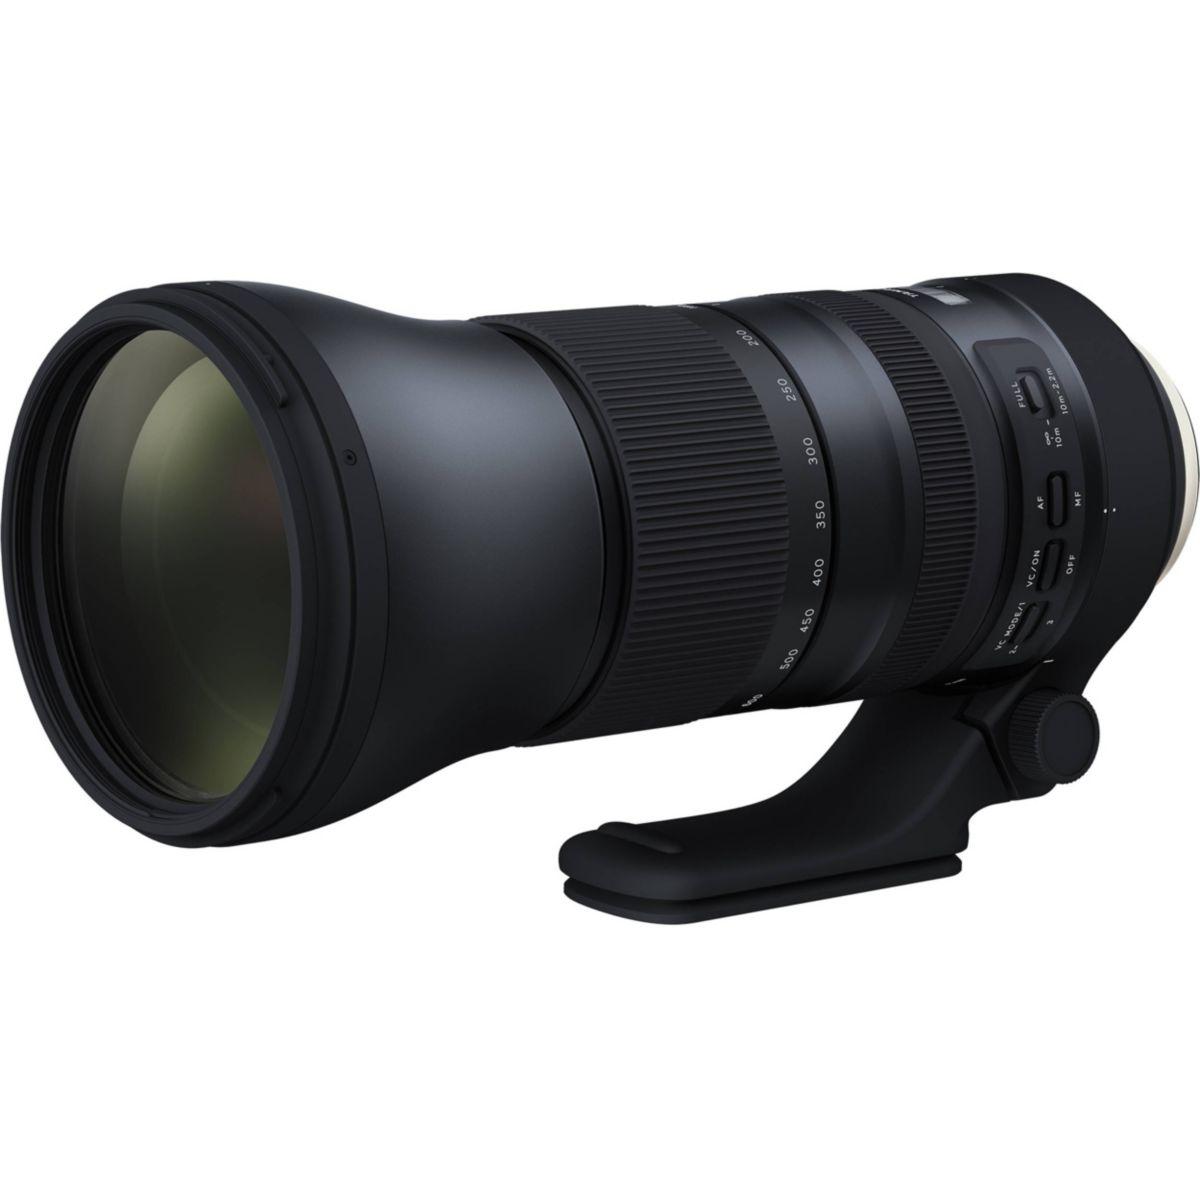 Objectif pour Reflex TAMRON SP 150-600mm F/5-6.3 Di USD G2 Son...